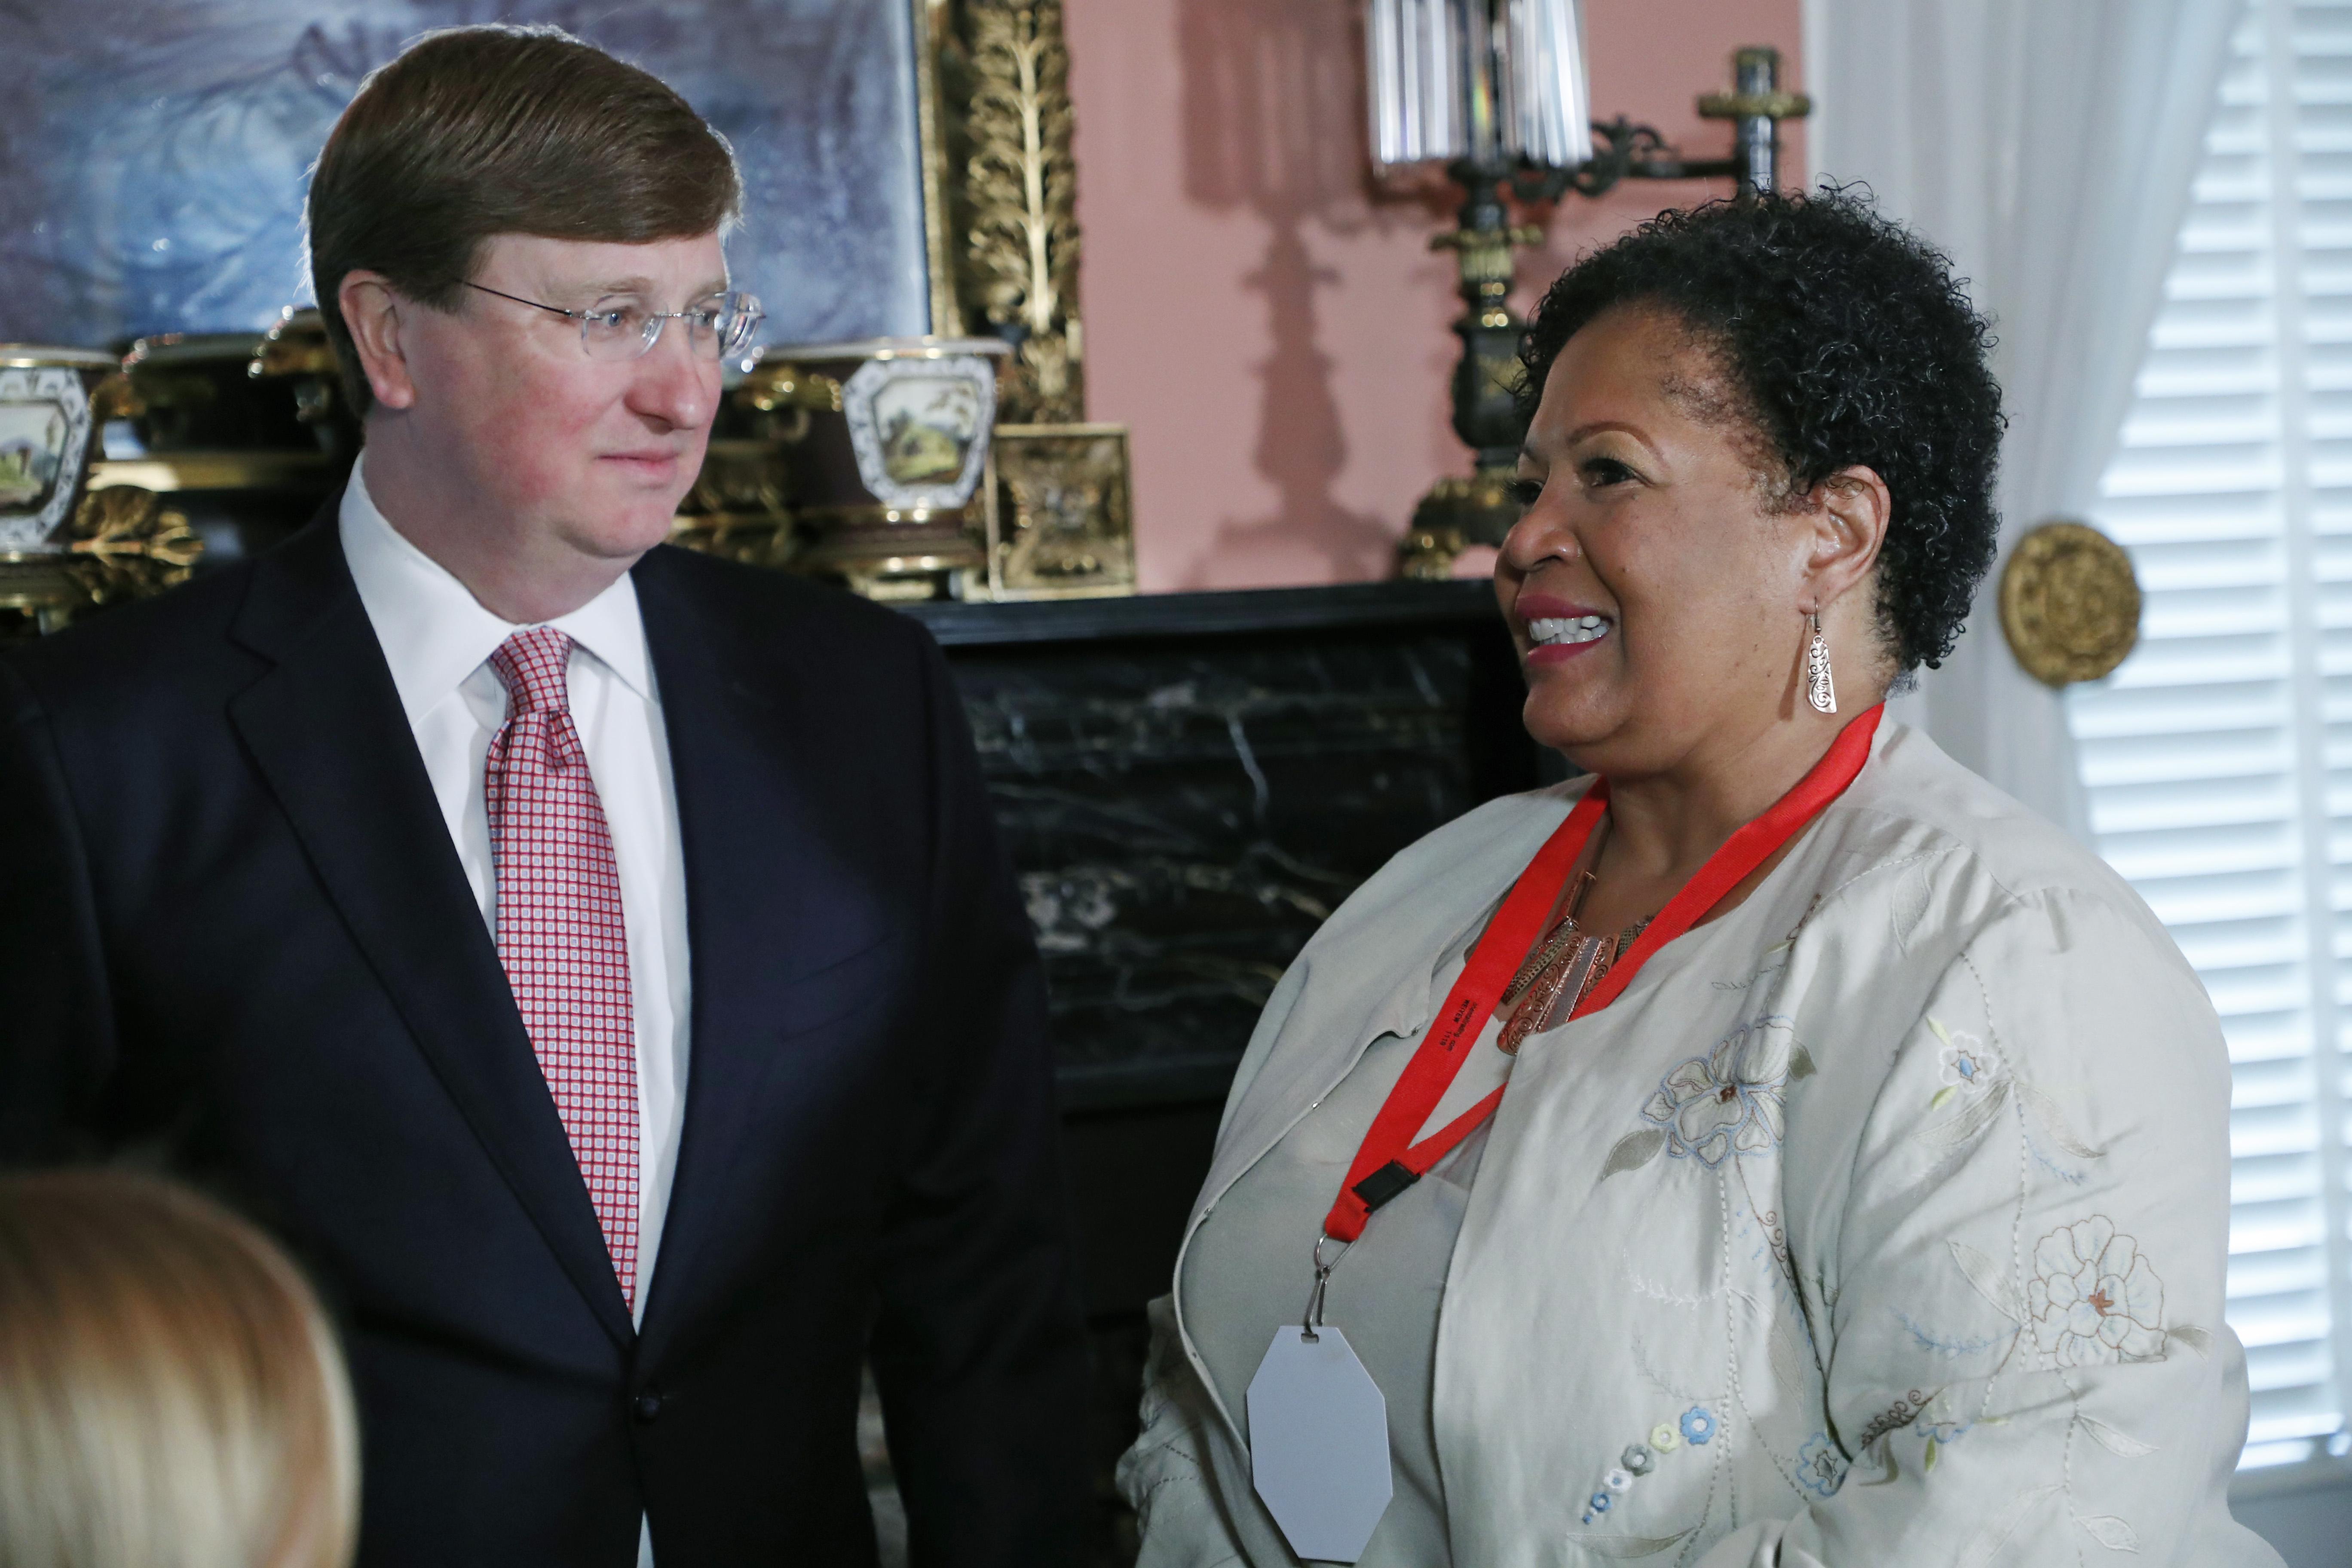 Mississippi governor signs bill retiring last state flag with Confederate battle emblem